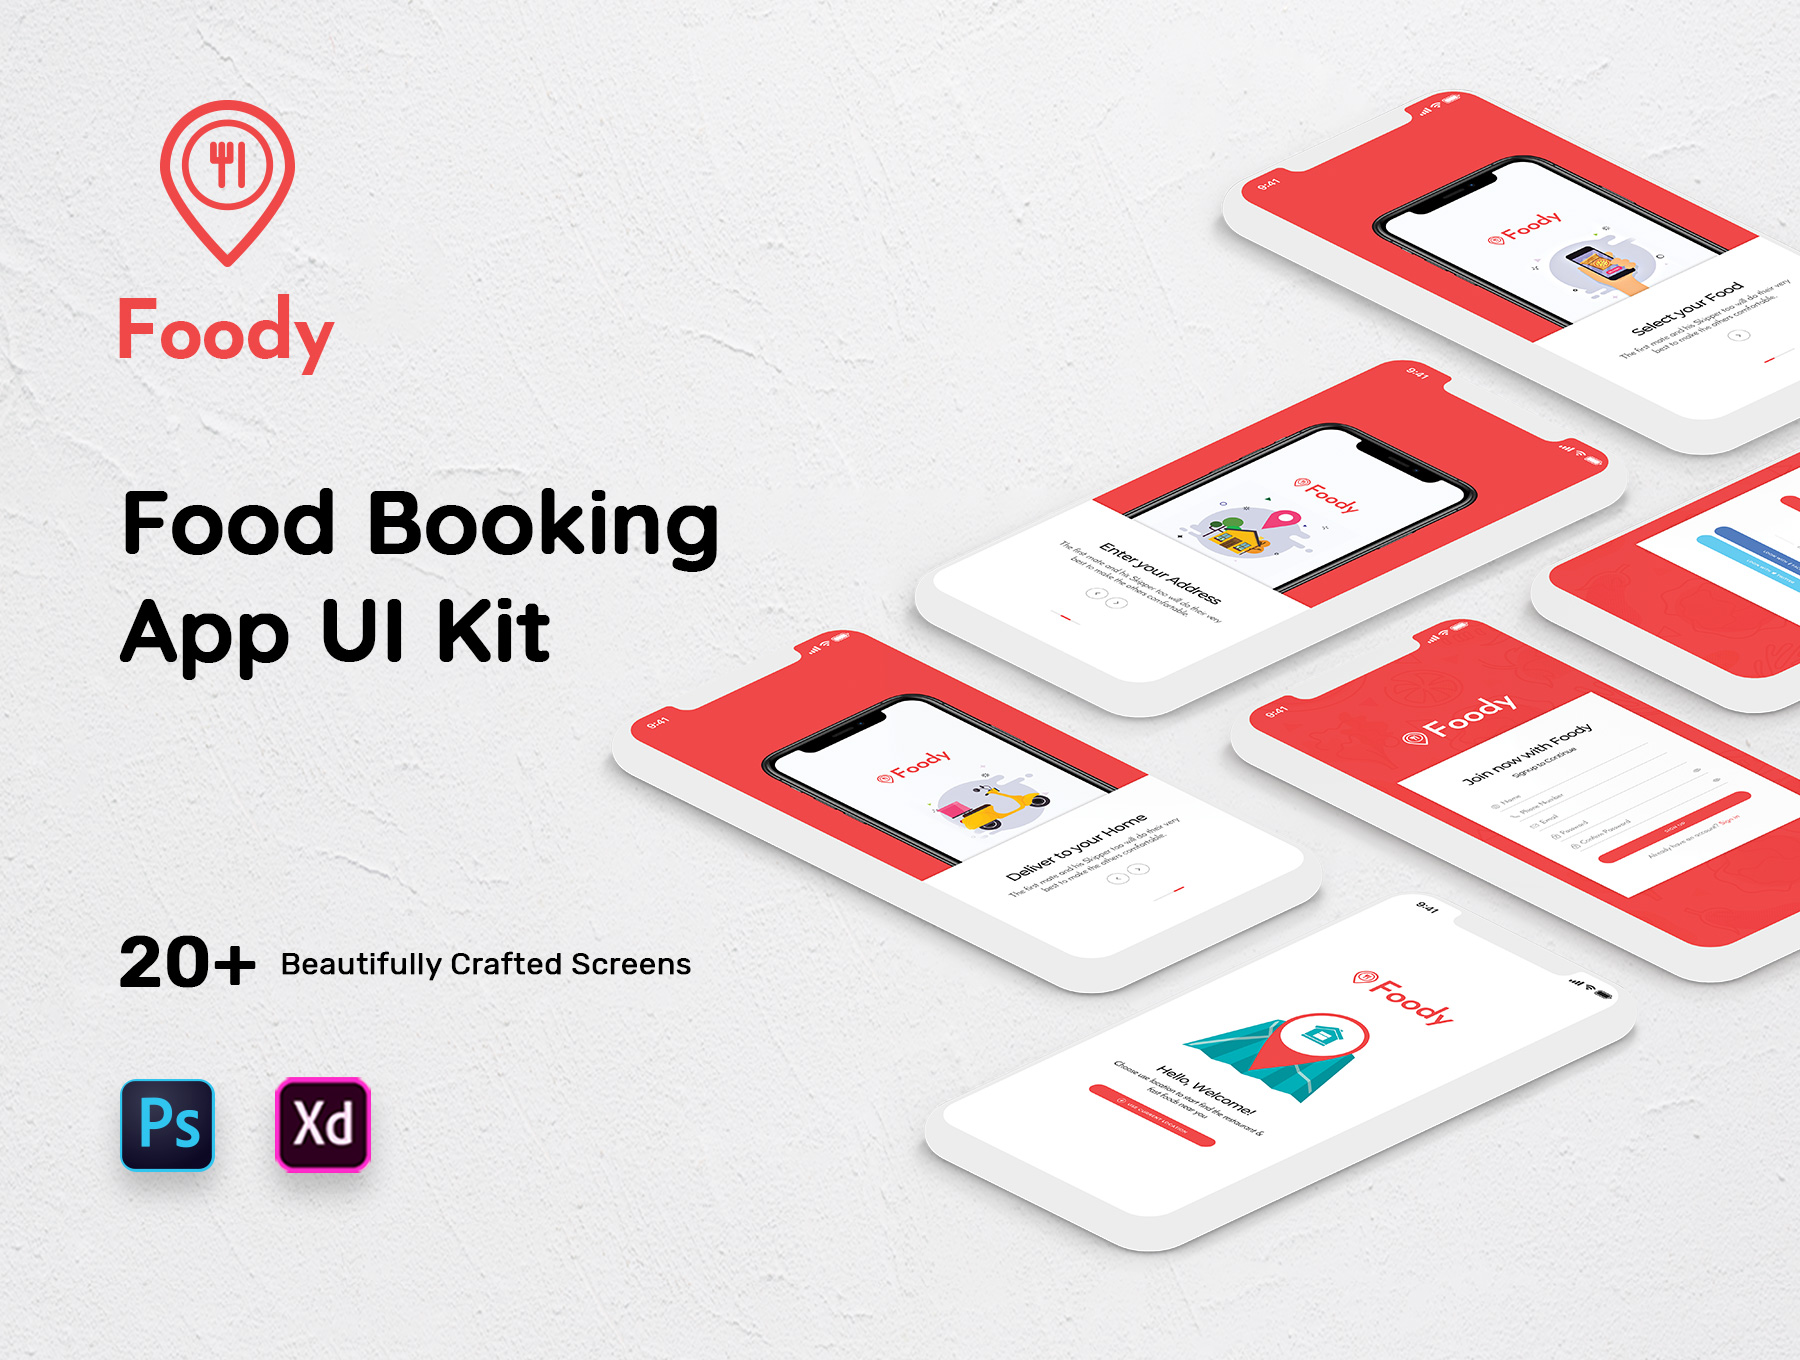 Foody Mobile App UI Kit